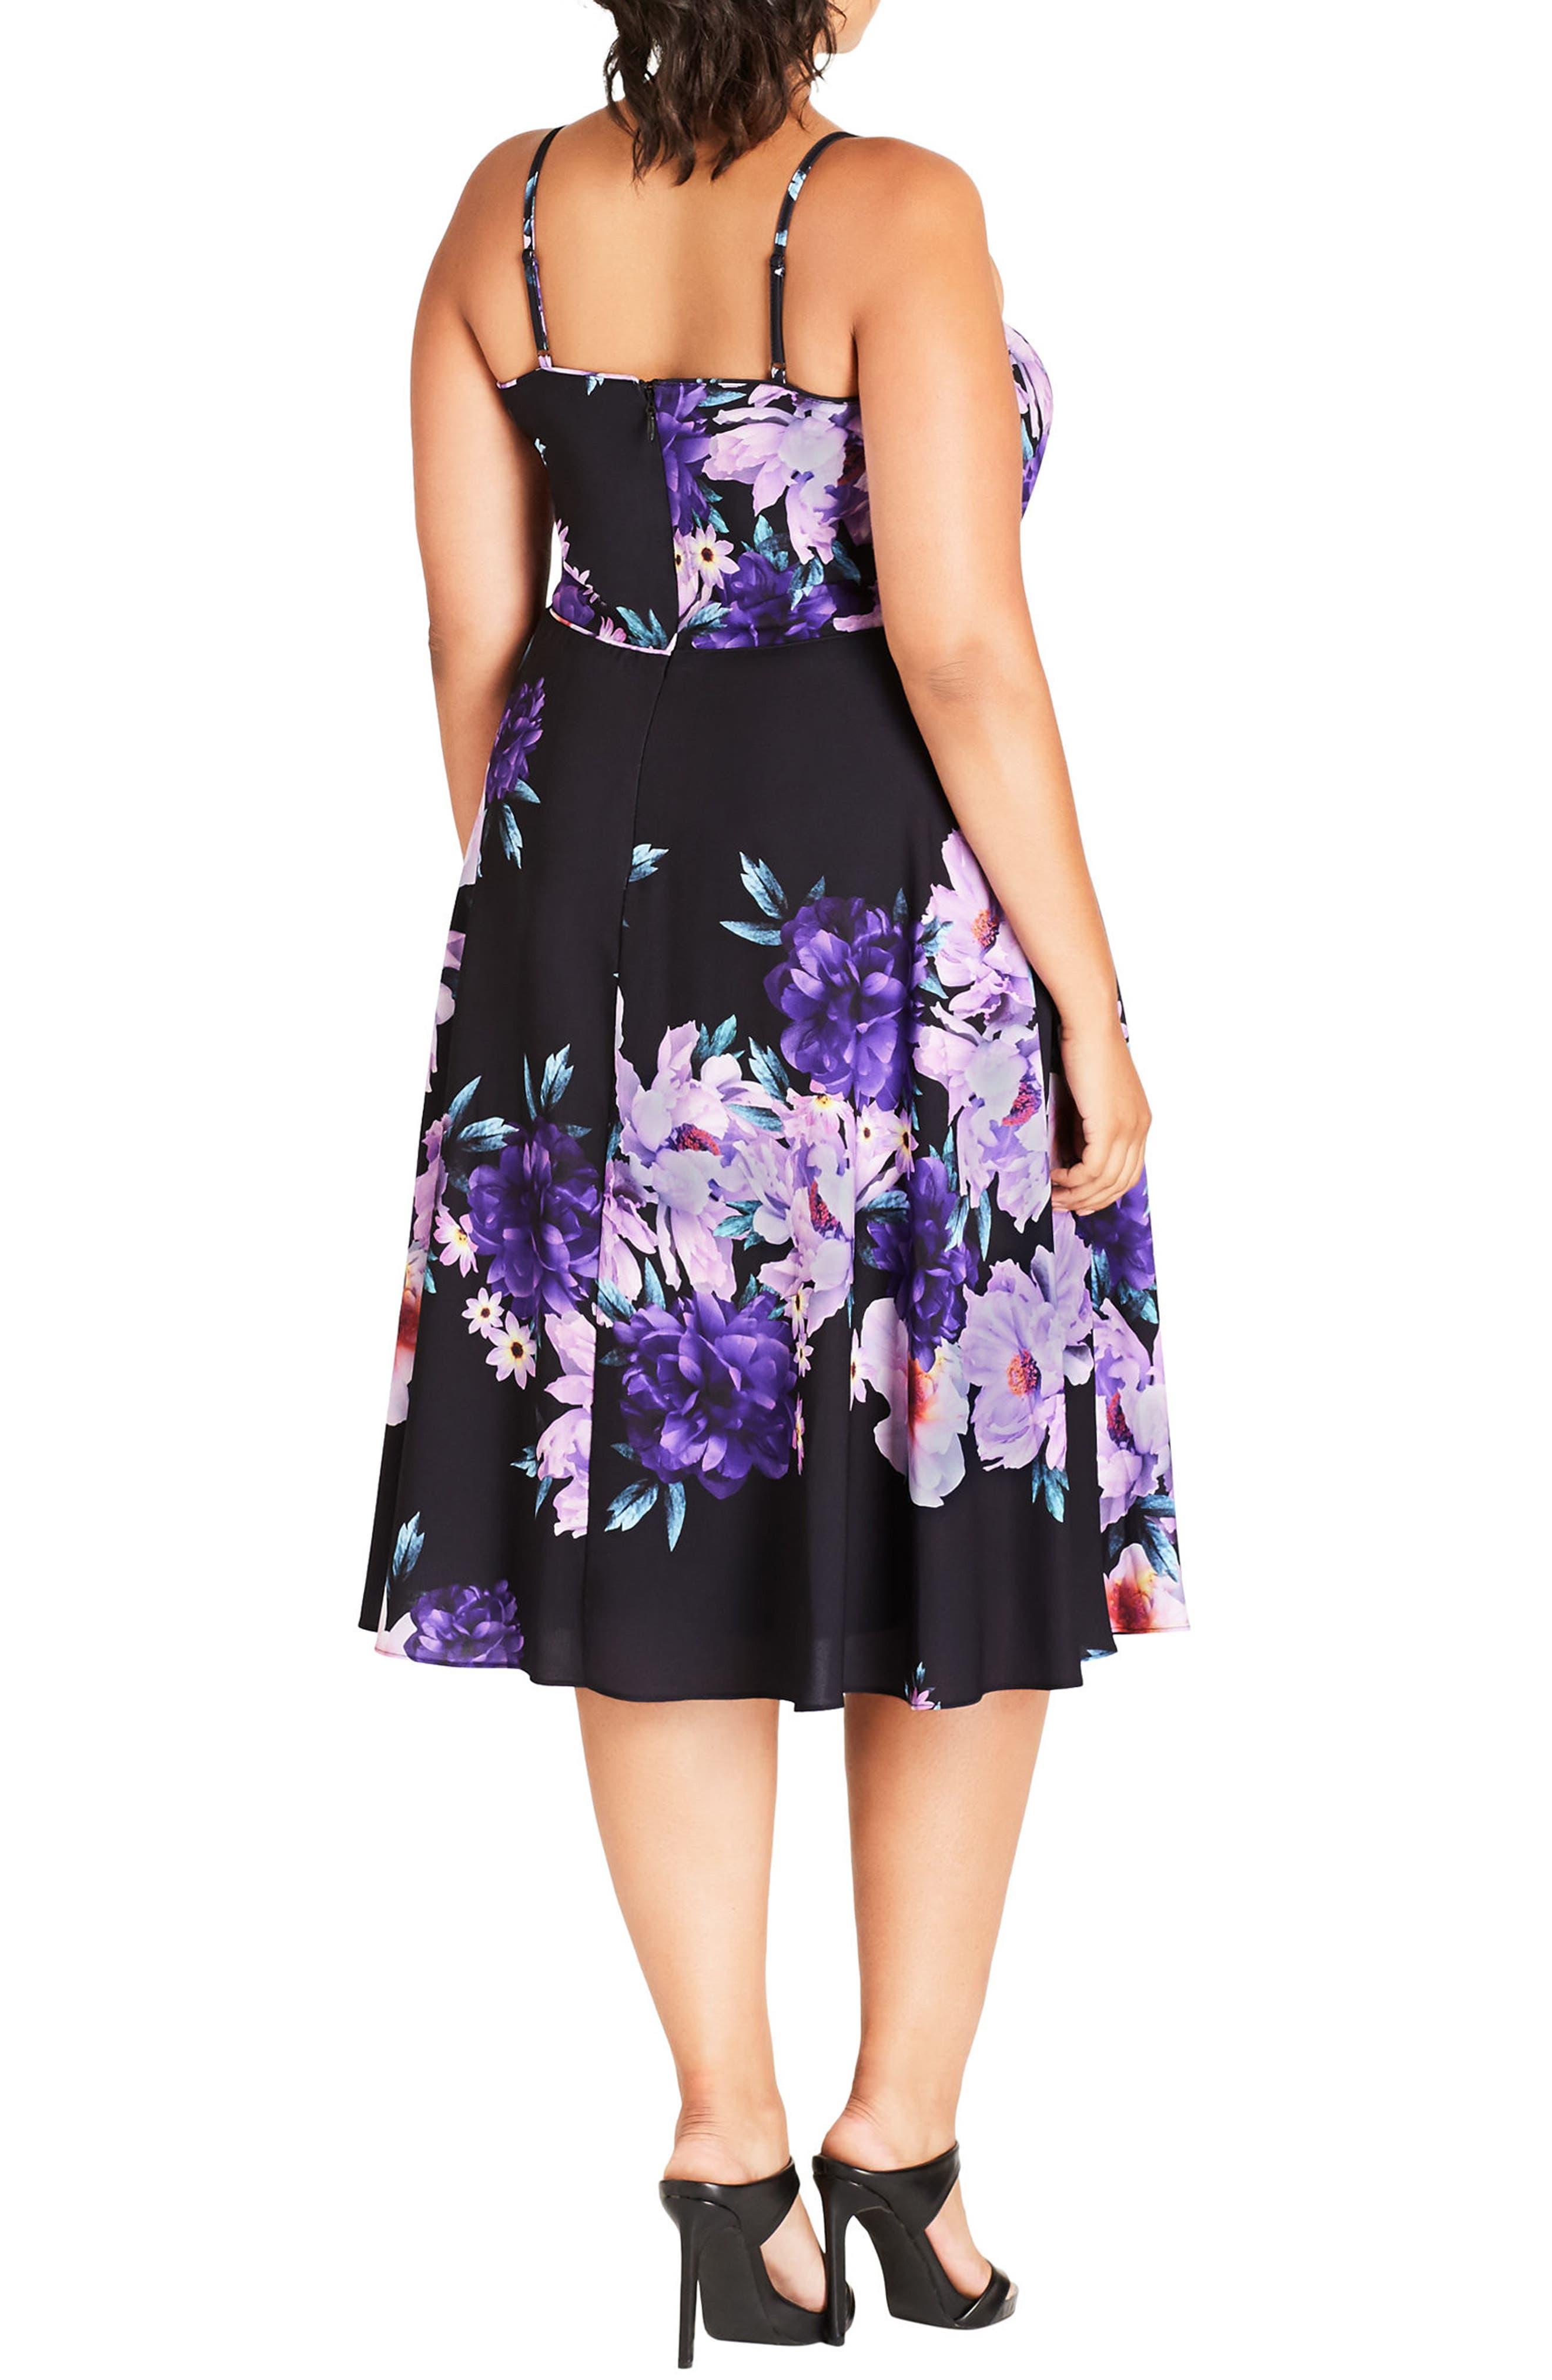 Summer Fling Floral Print Midi Dress,                             Alternate thumbnail 2, color,                             650